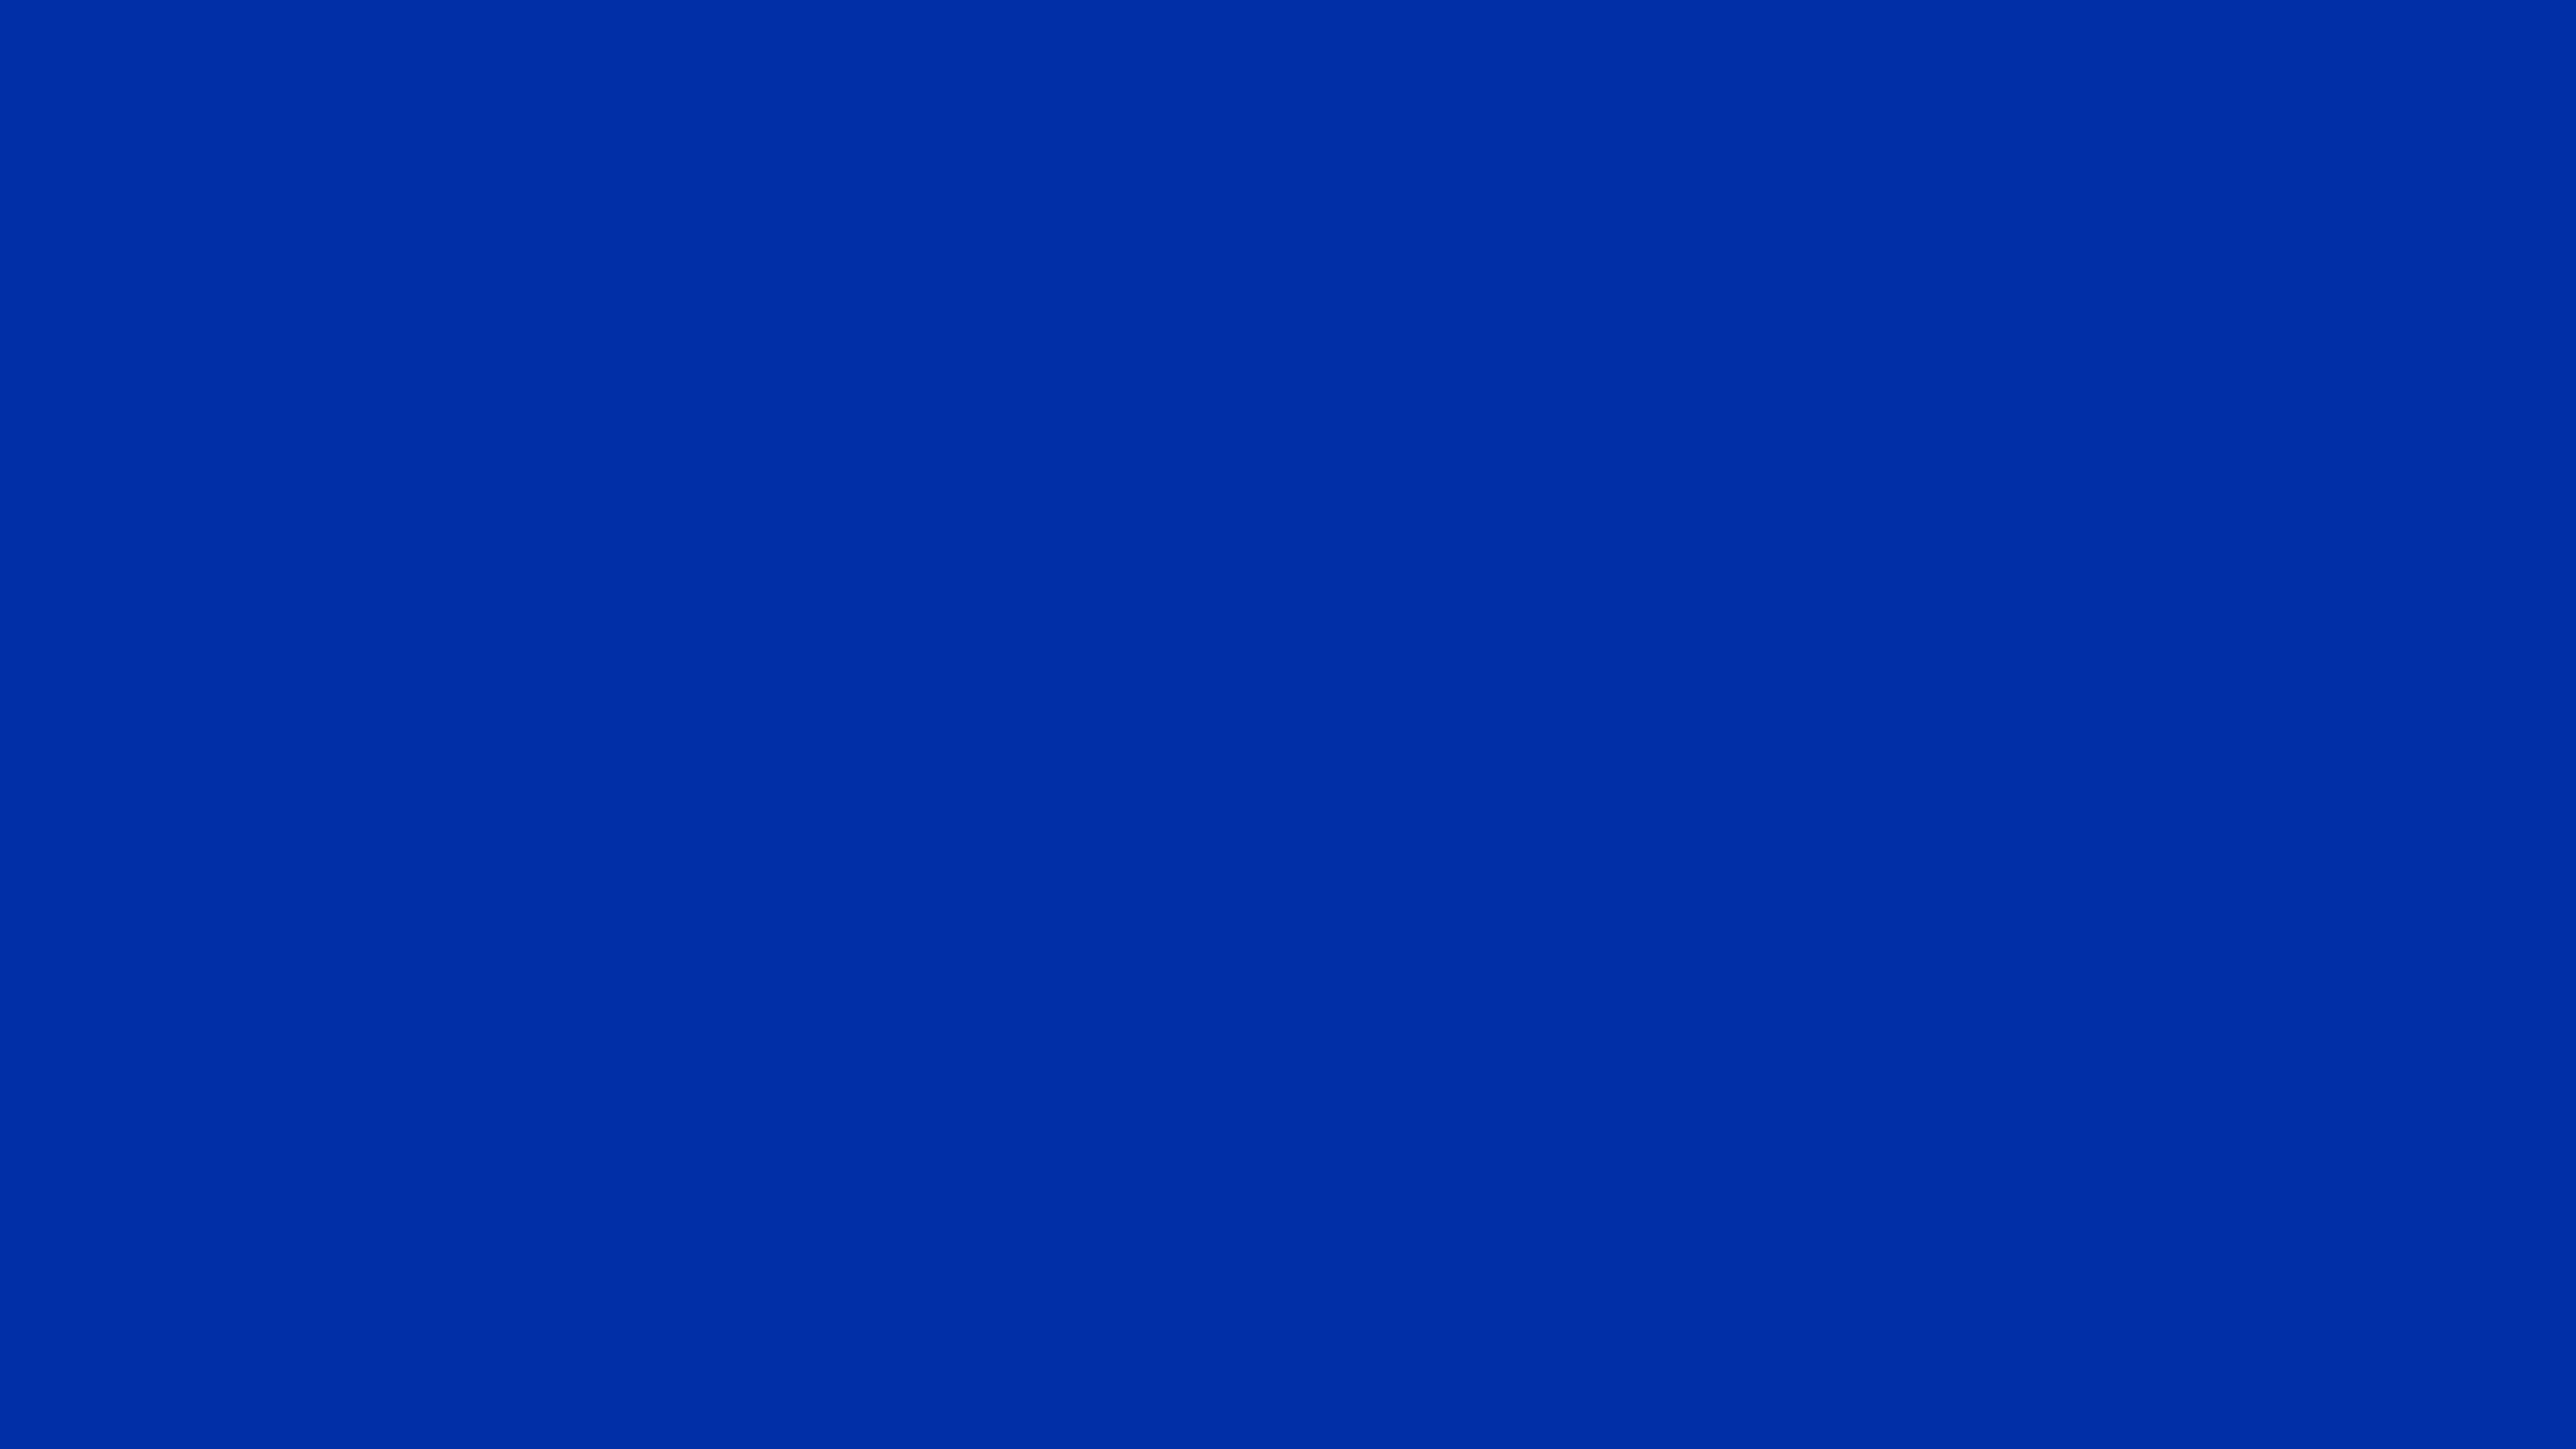 4096x2304 International Klein Blue Solid Color Background